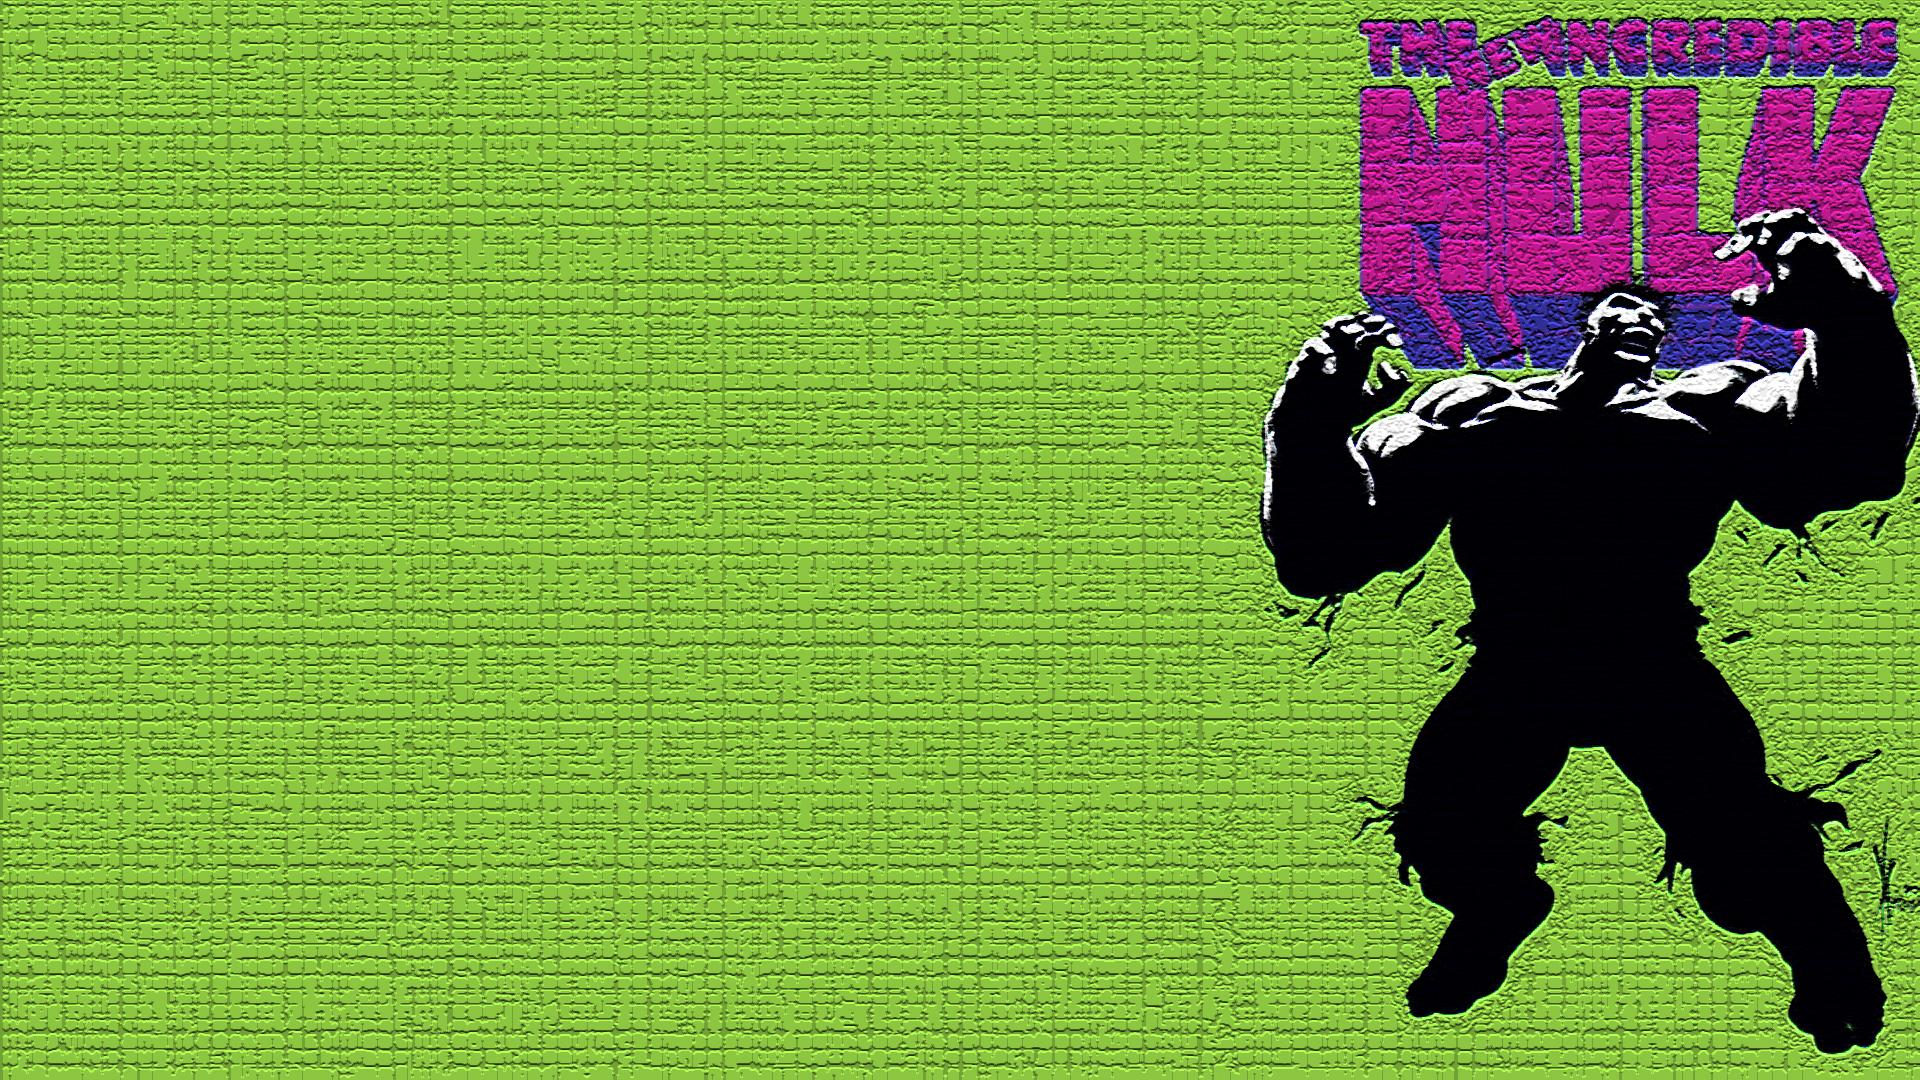 The Incredible Hulk Hd Wallpaper Background Image 1920x1080